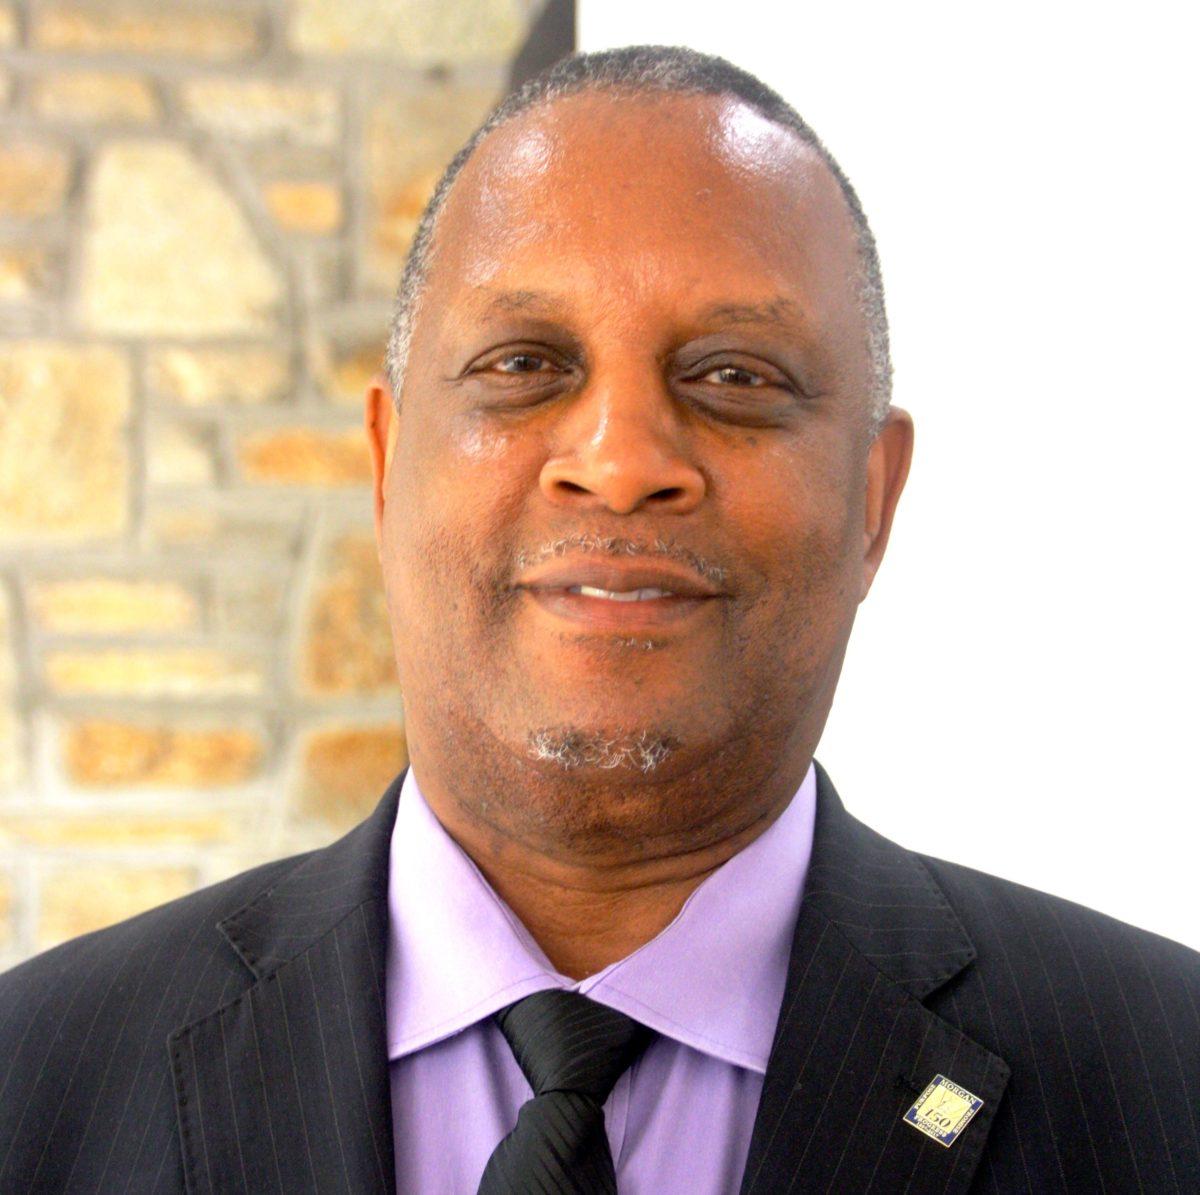 Asamoah Nkwanta